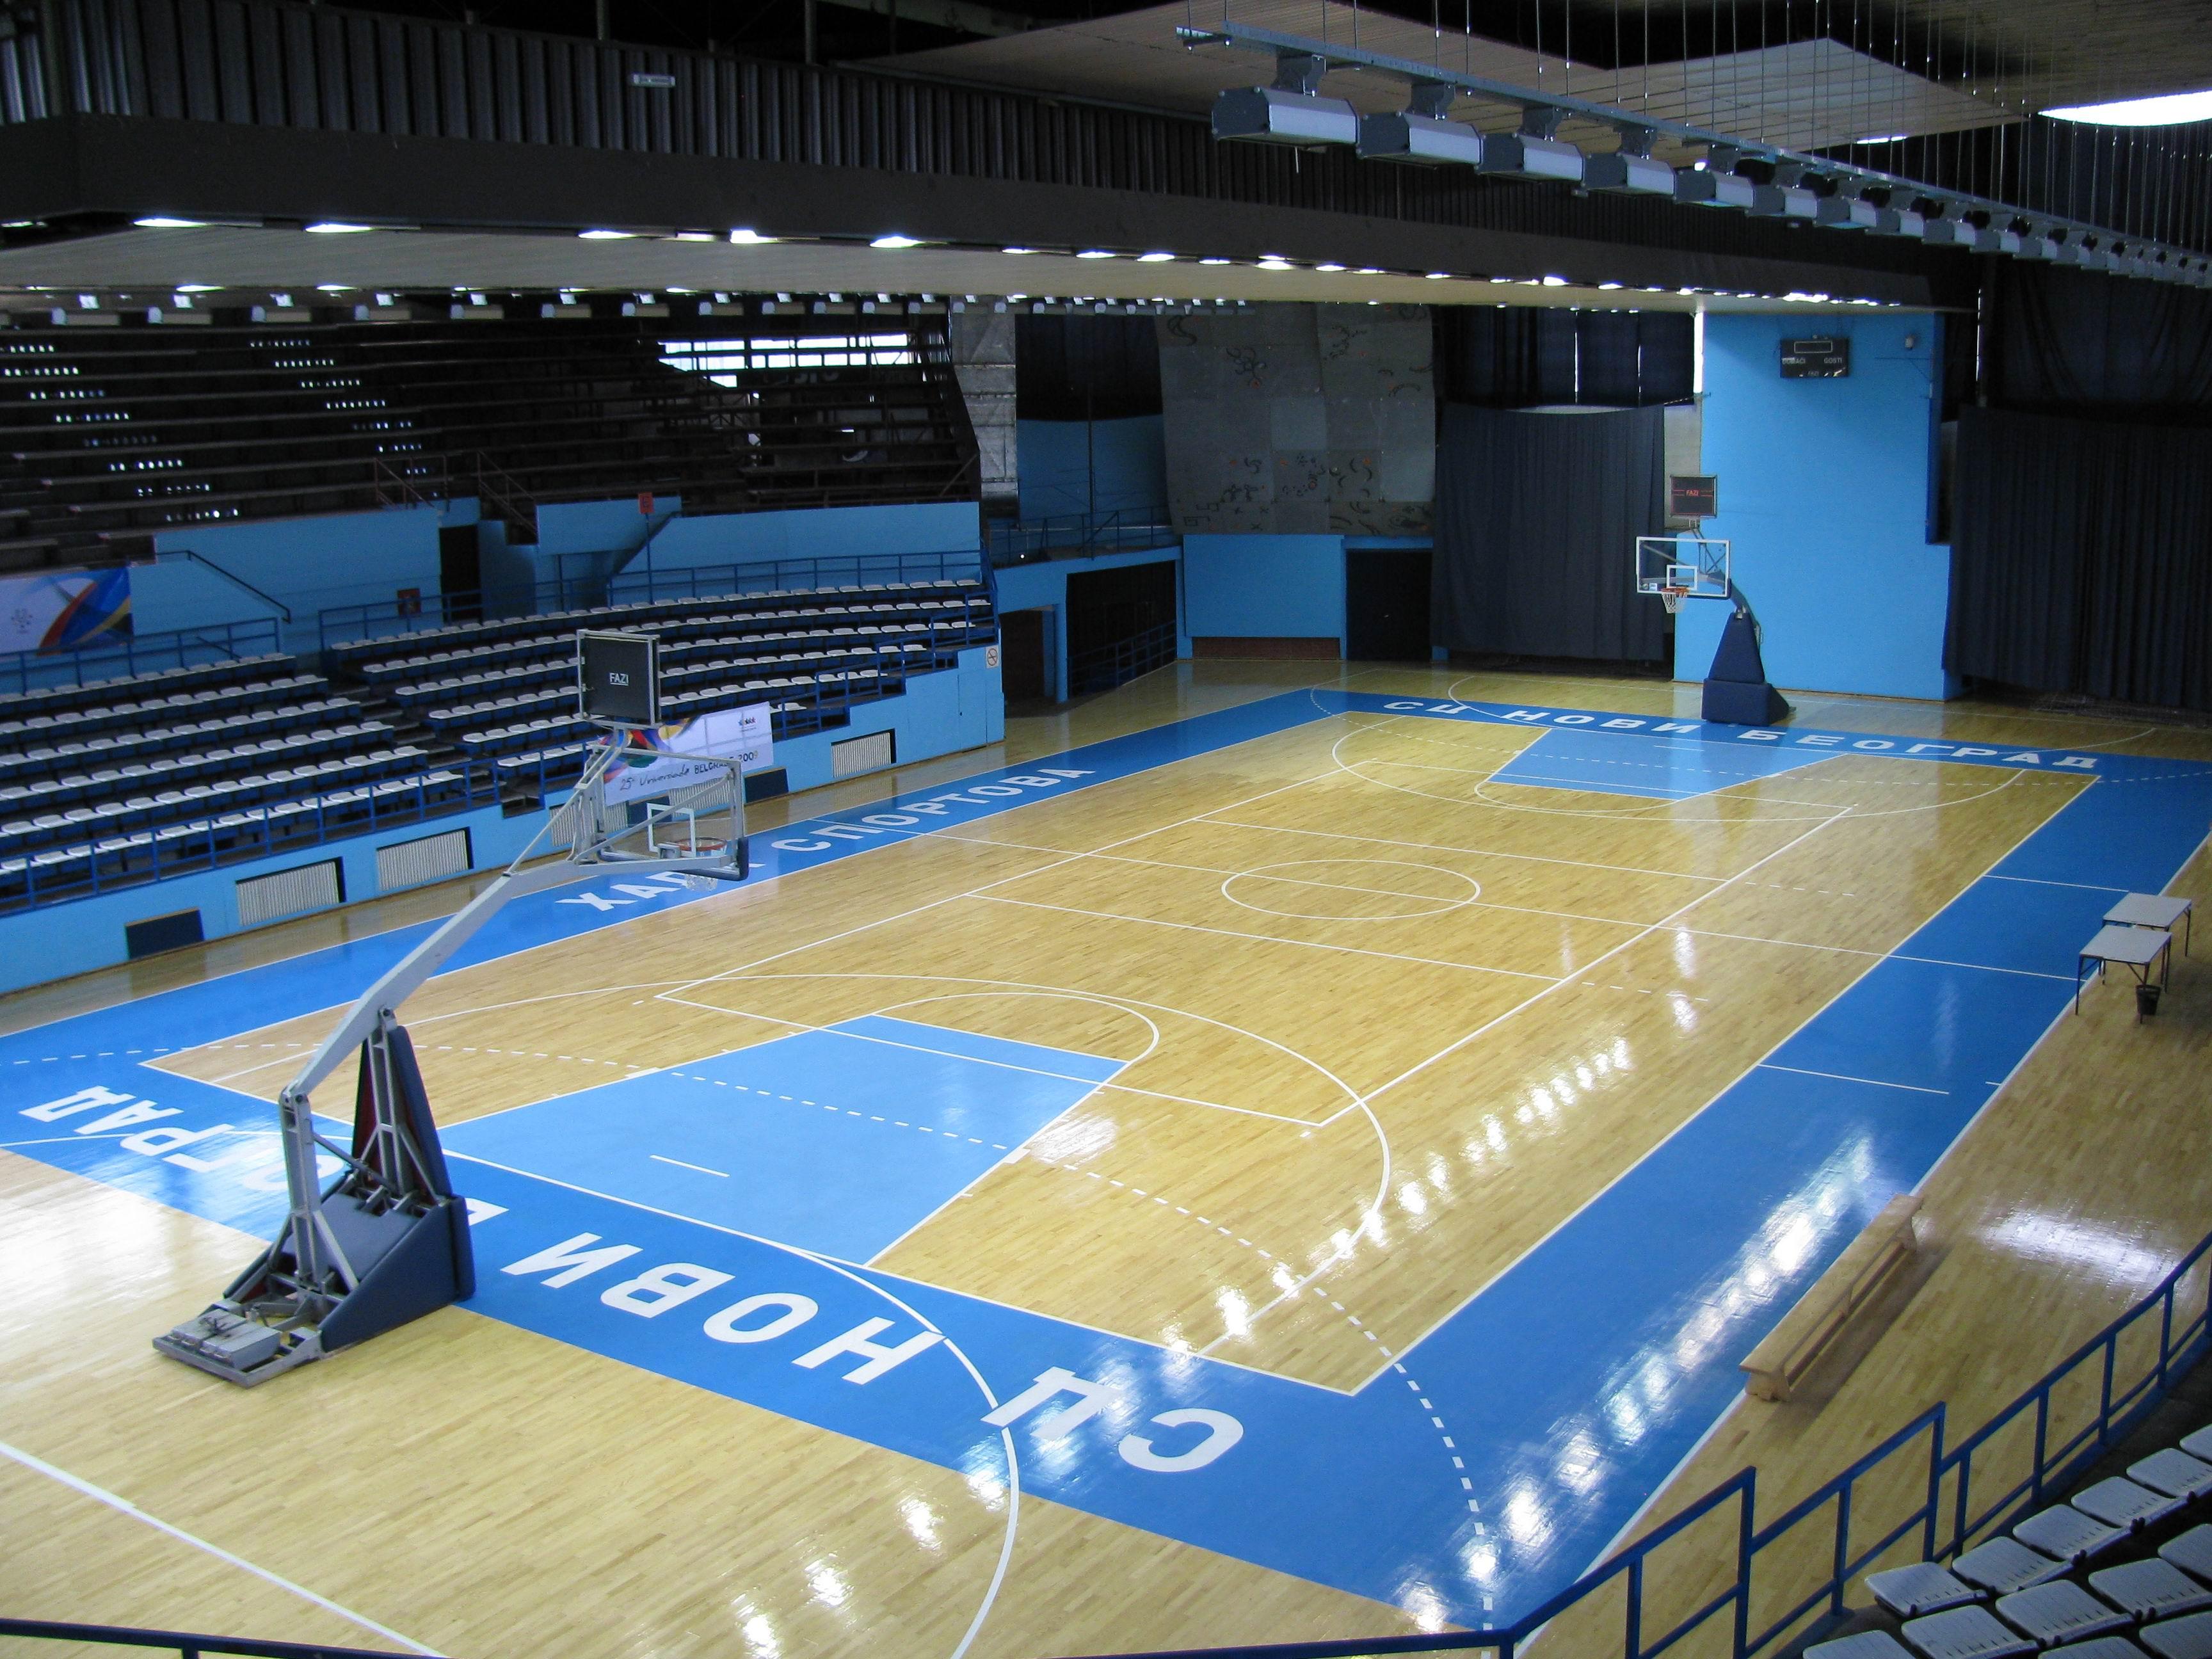 Hala Sportova Beograd Mapa Superjoden